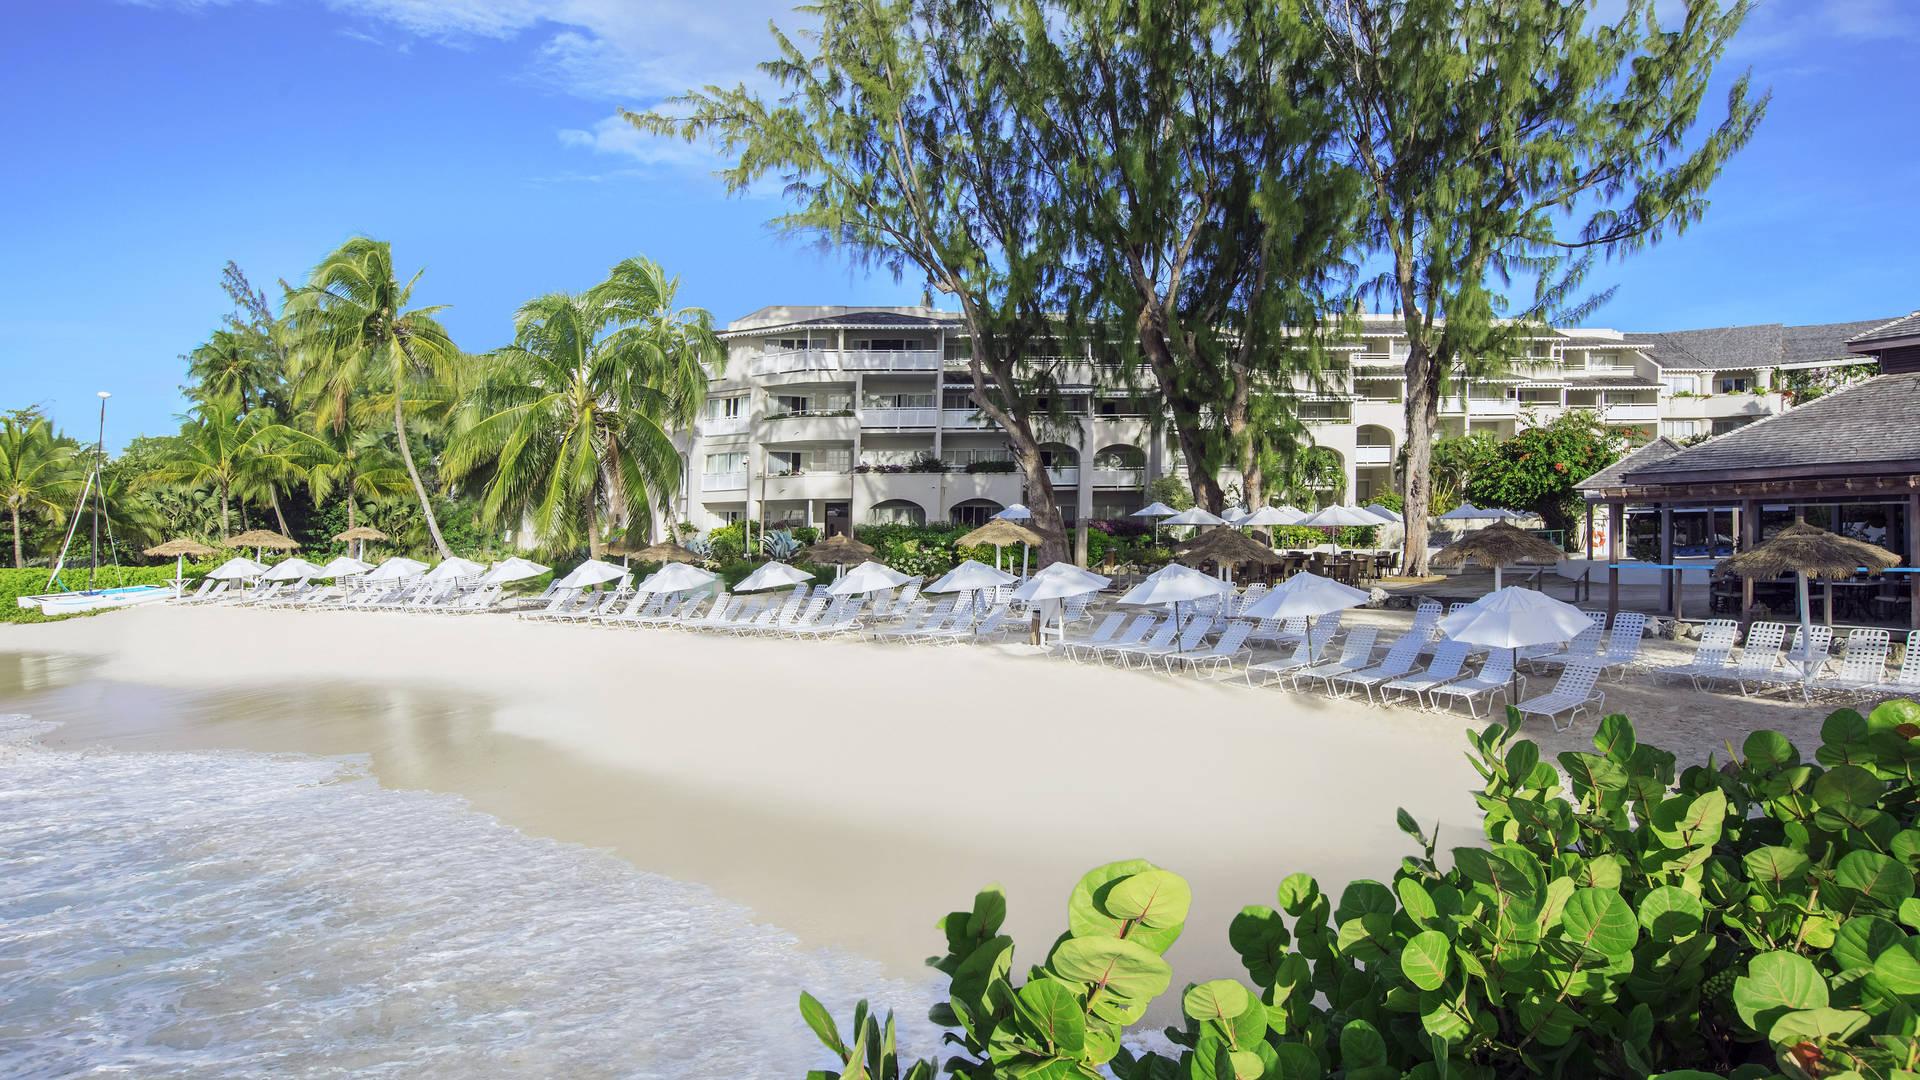 bougainvillea-beach-hotel-front-view.jpg